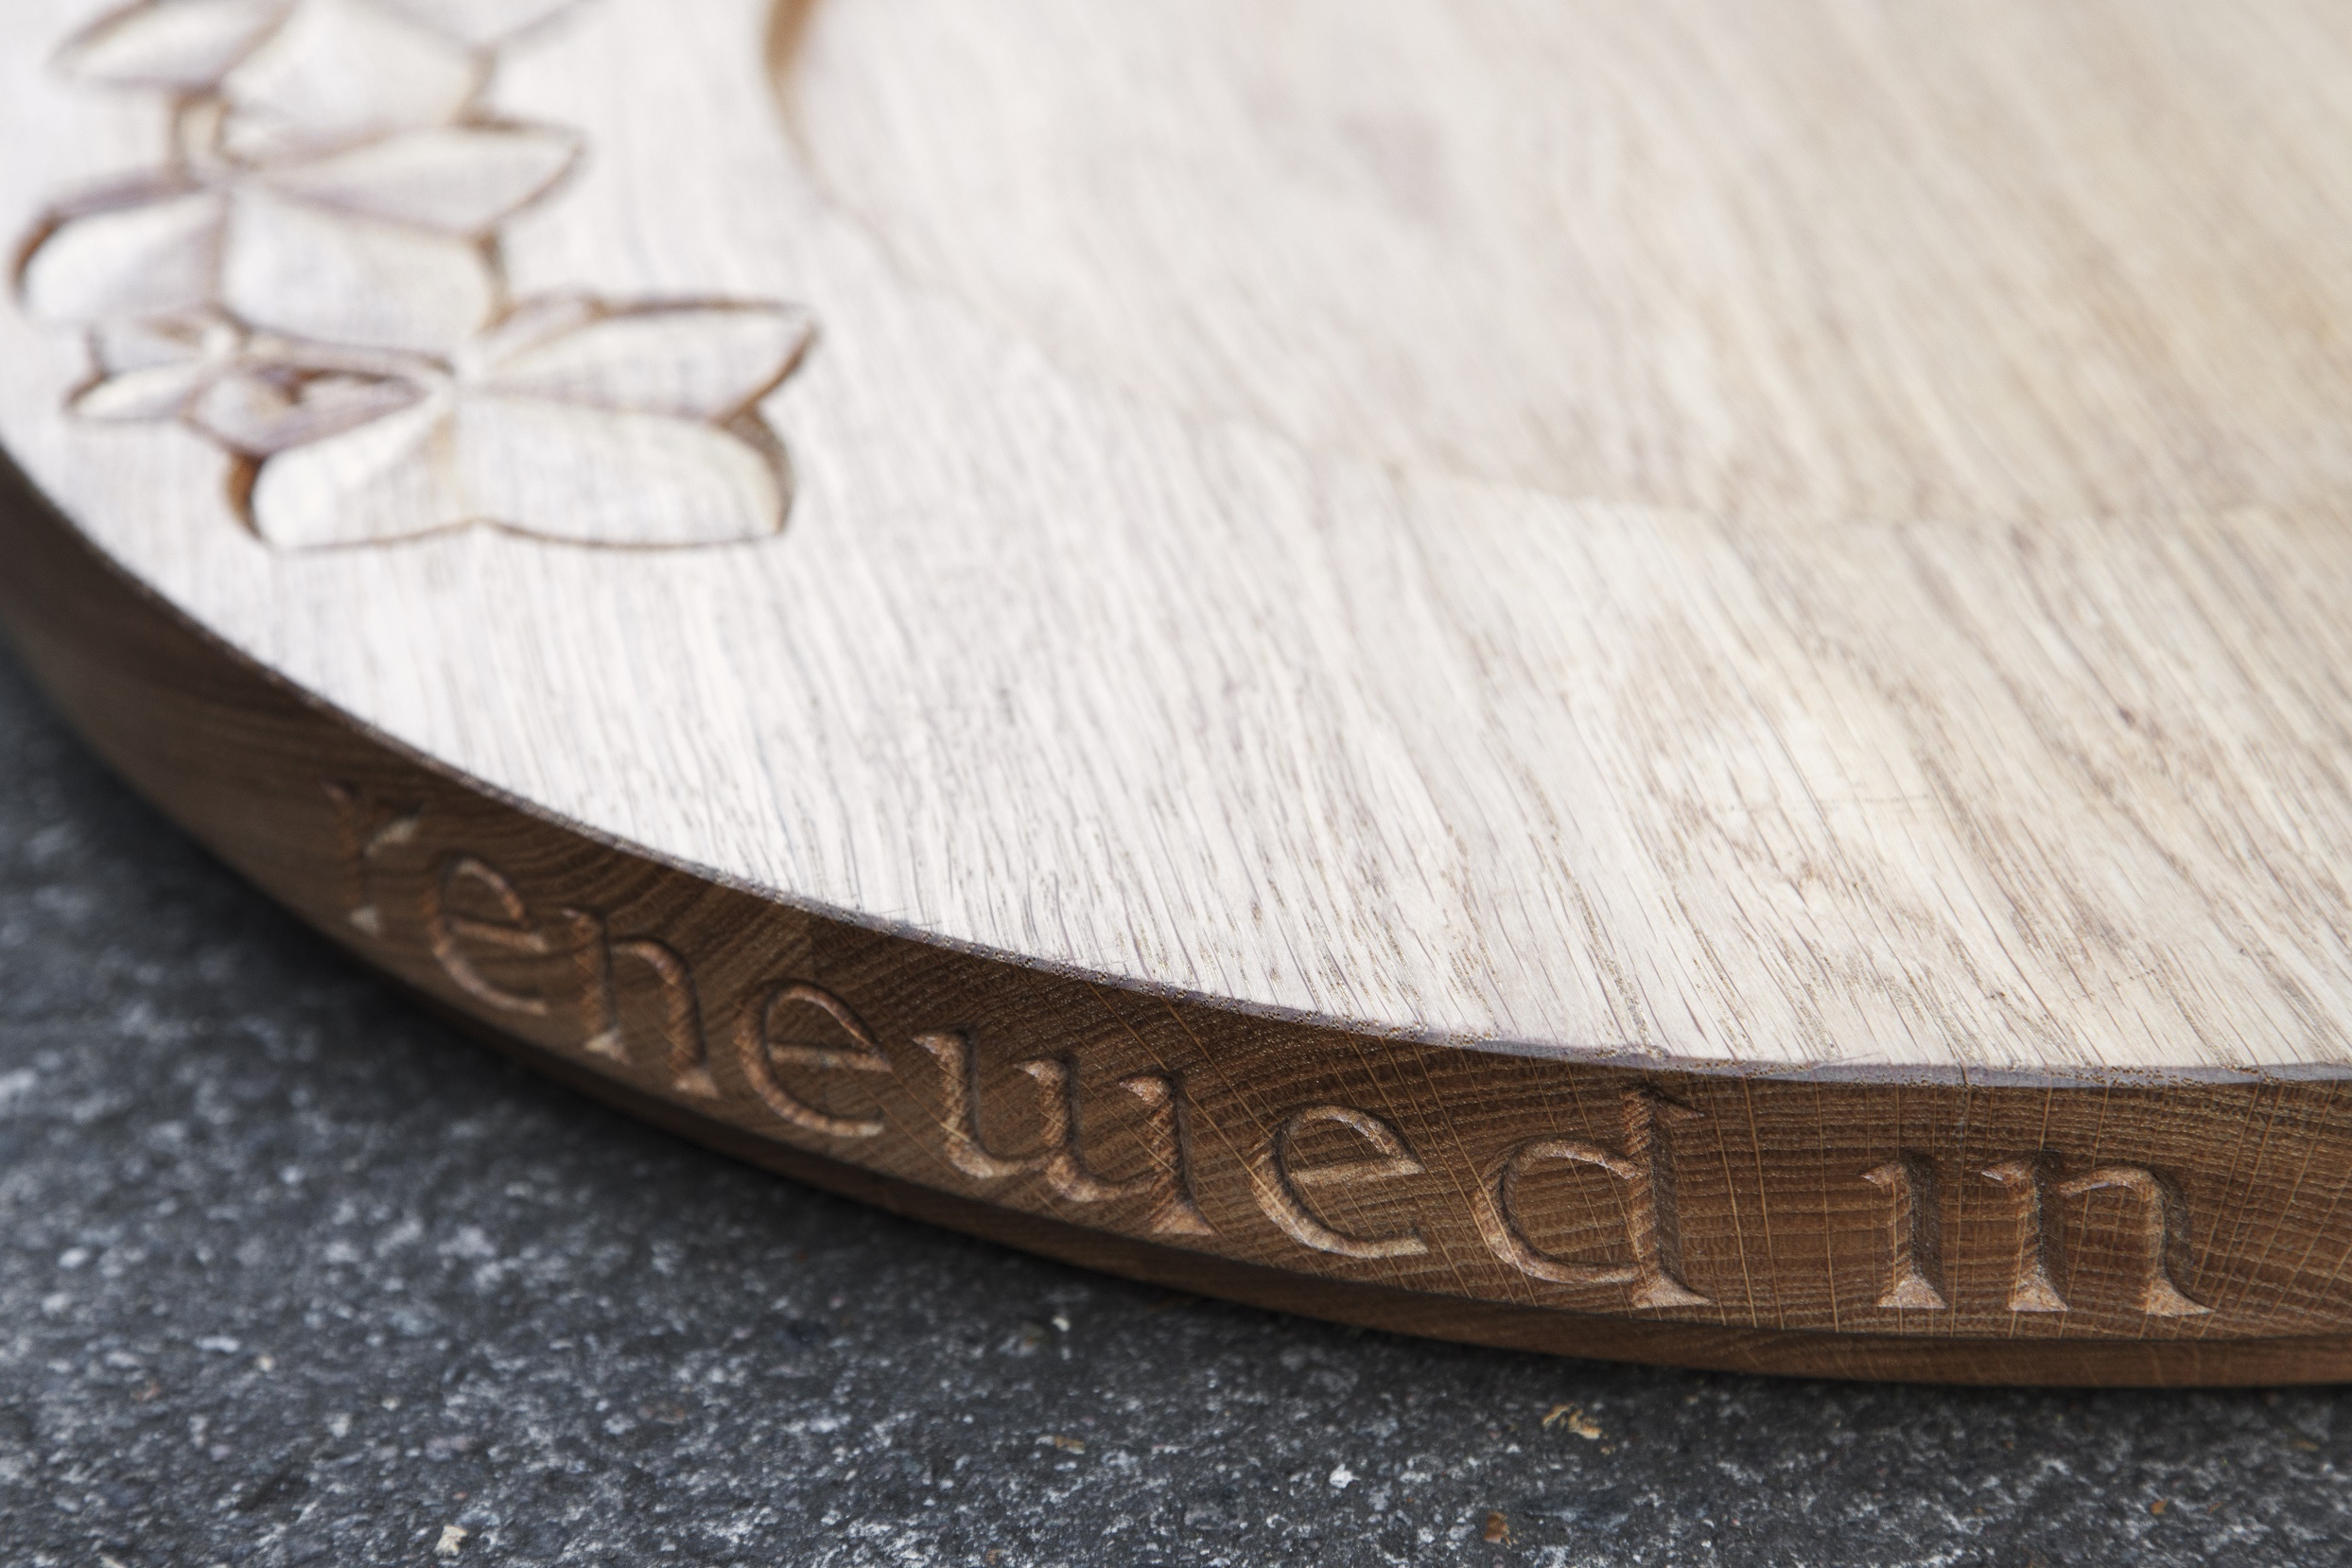 Font Cover in Oak